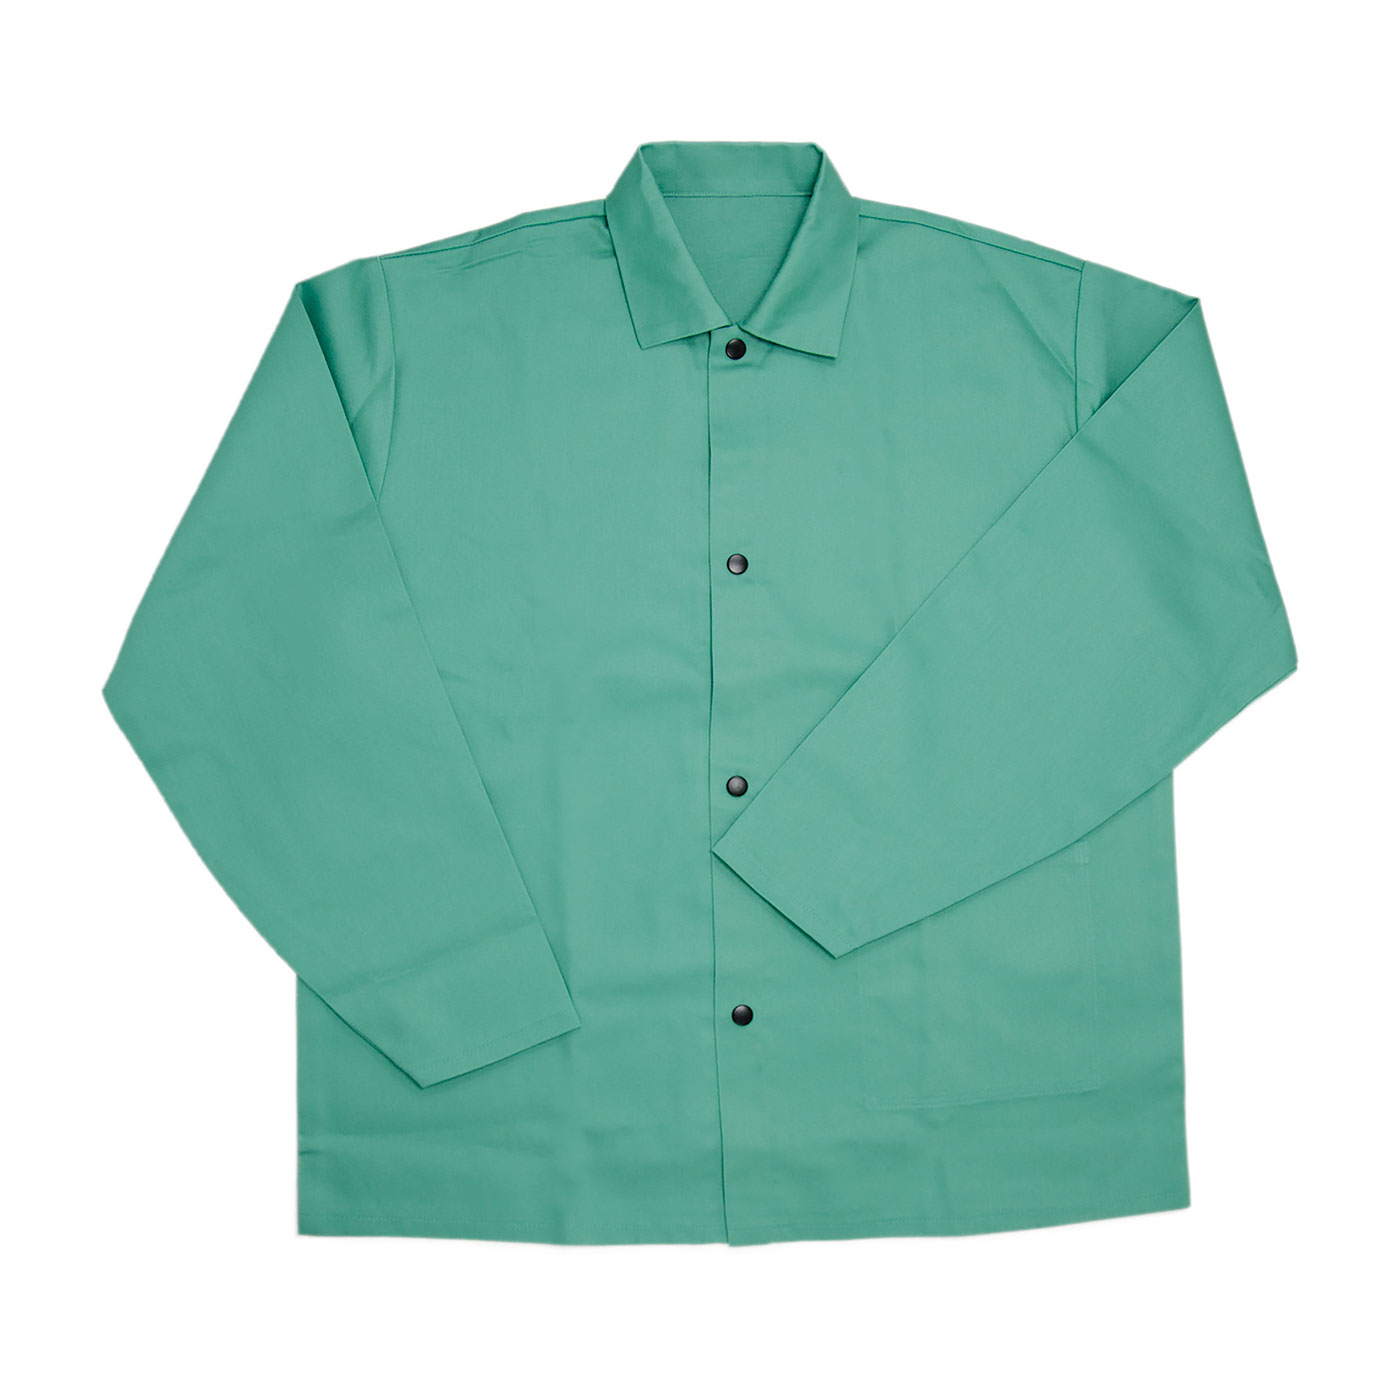 "Economy FR Treated 100% Cotton Welders Jacket - 30"", Green, 2XL"